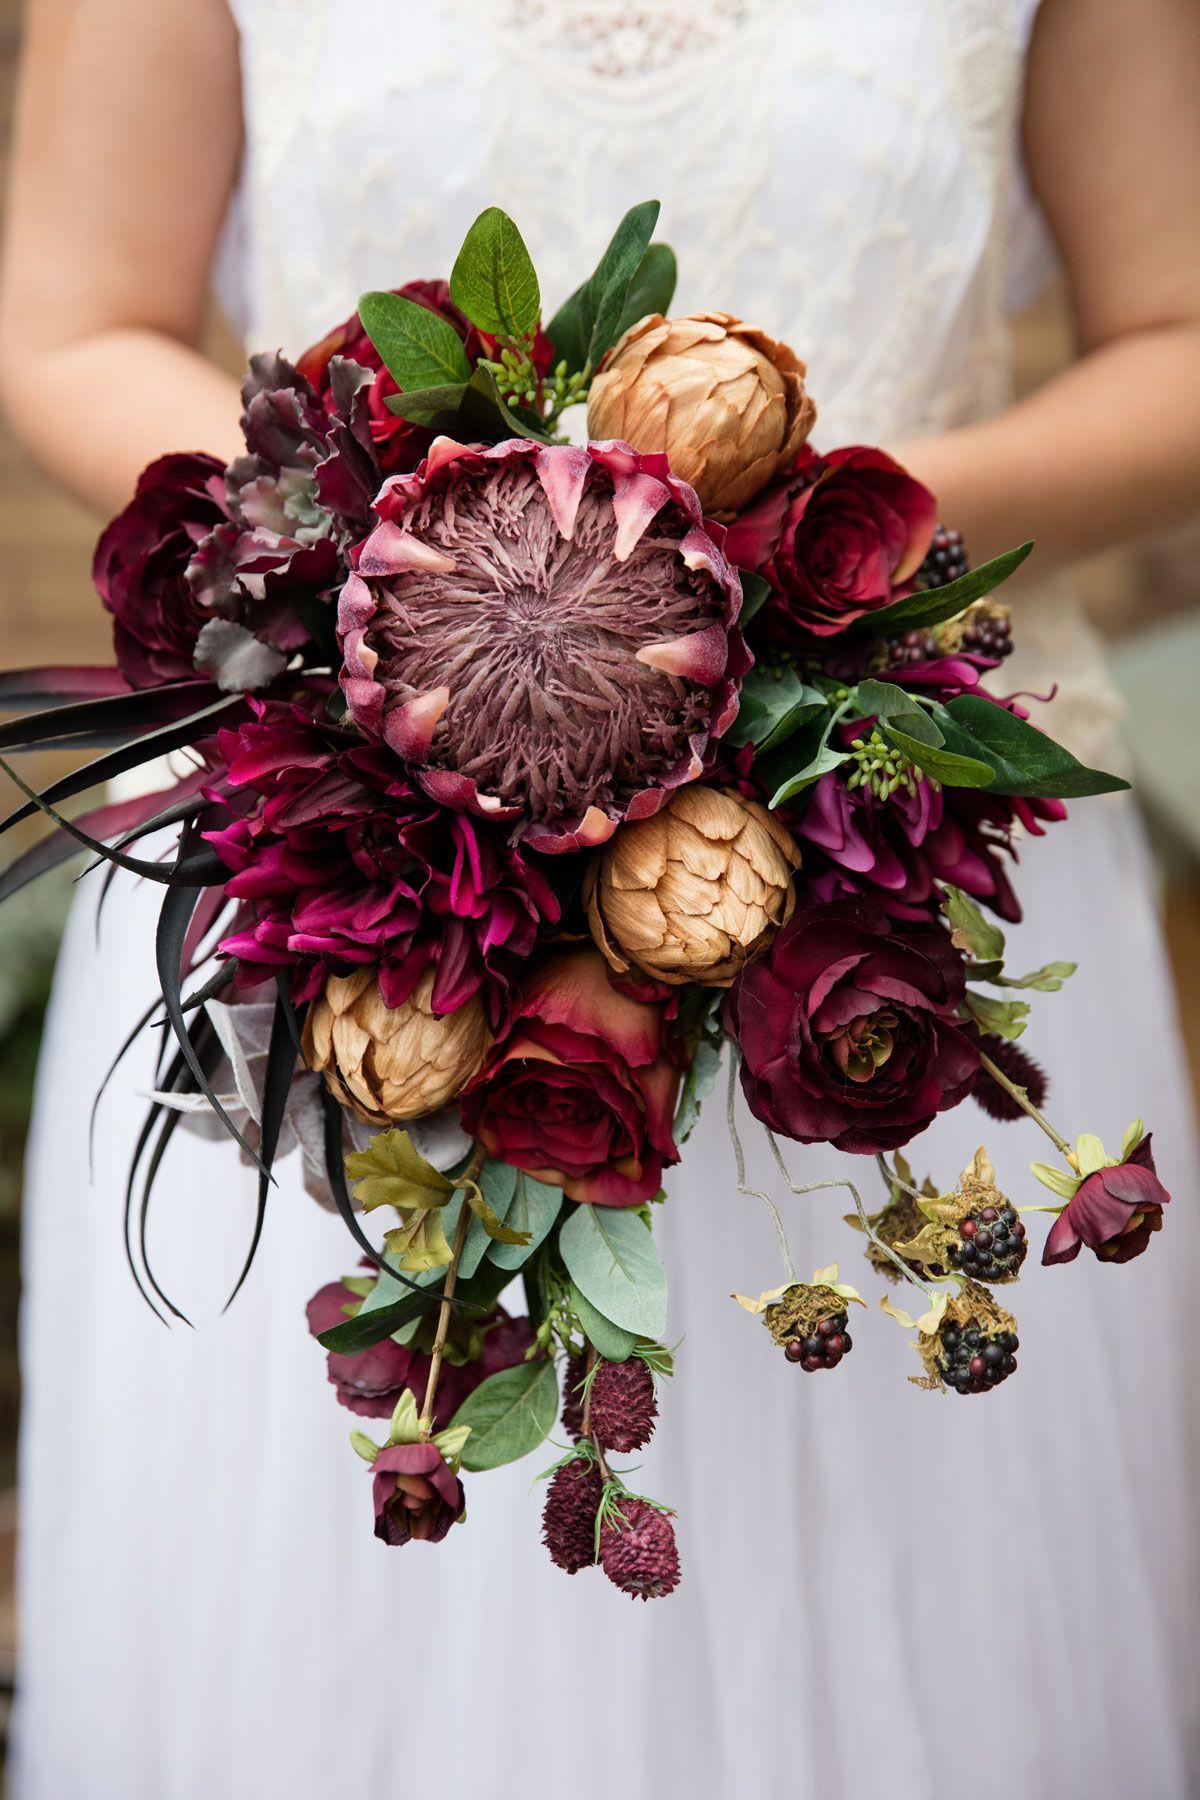 Burgundy Bridal Bouquet Wedding flower decorations